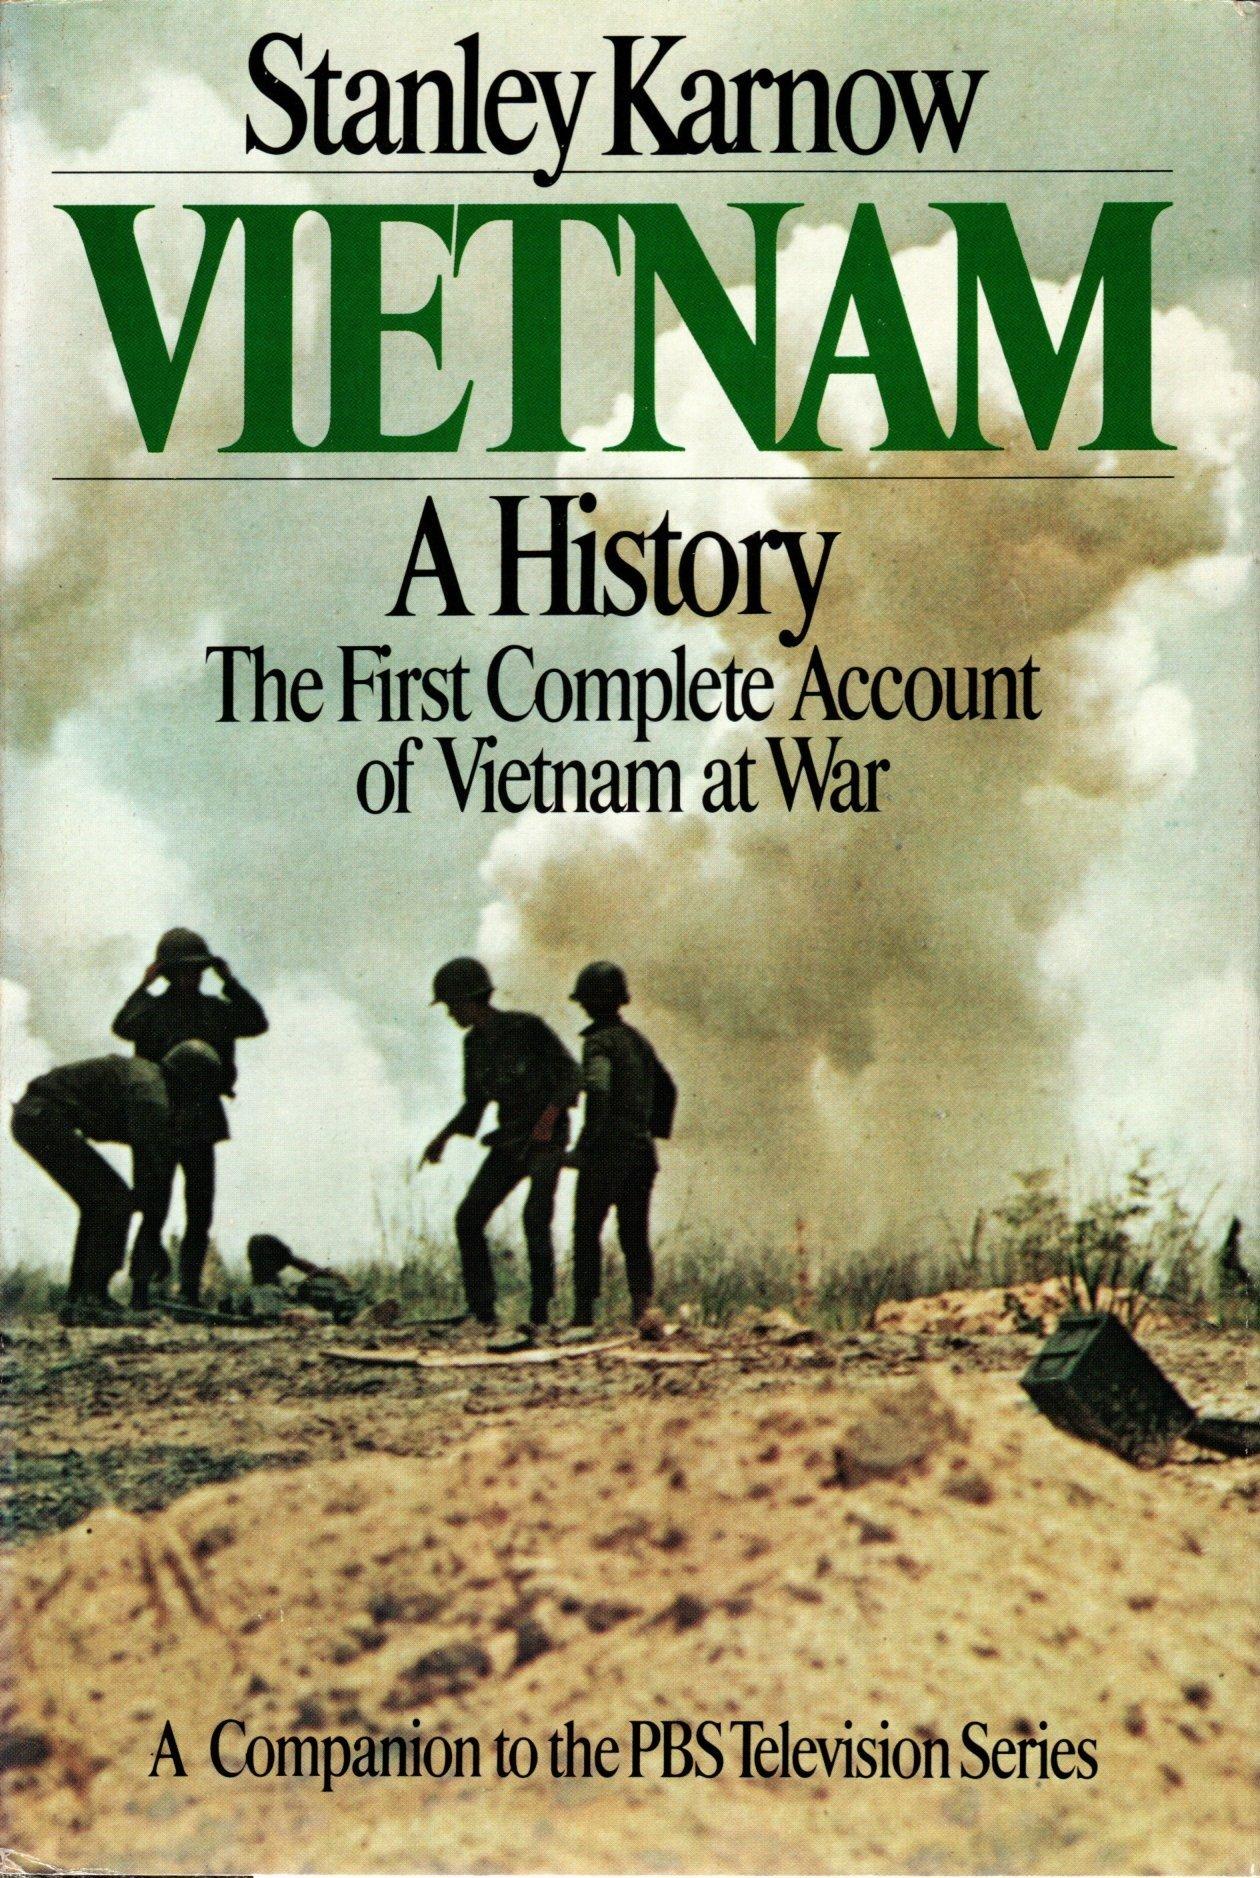 Vietnam: A History: Karnow, Stanley: 9780670746040: Amazon.com: Books